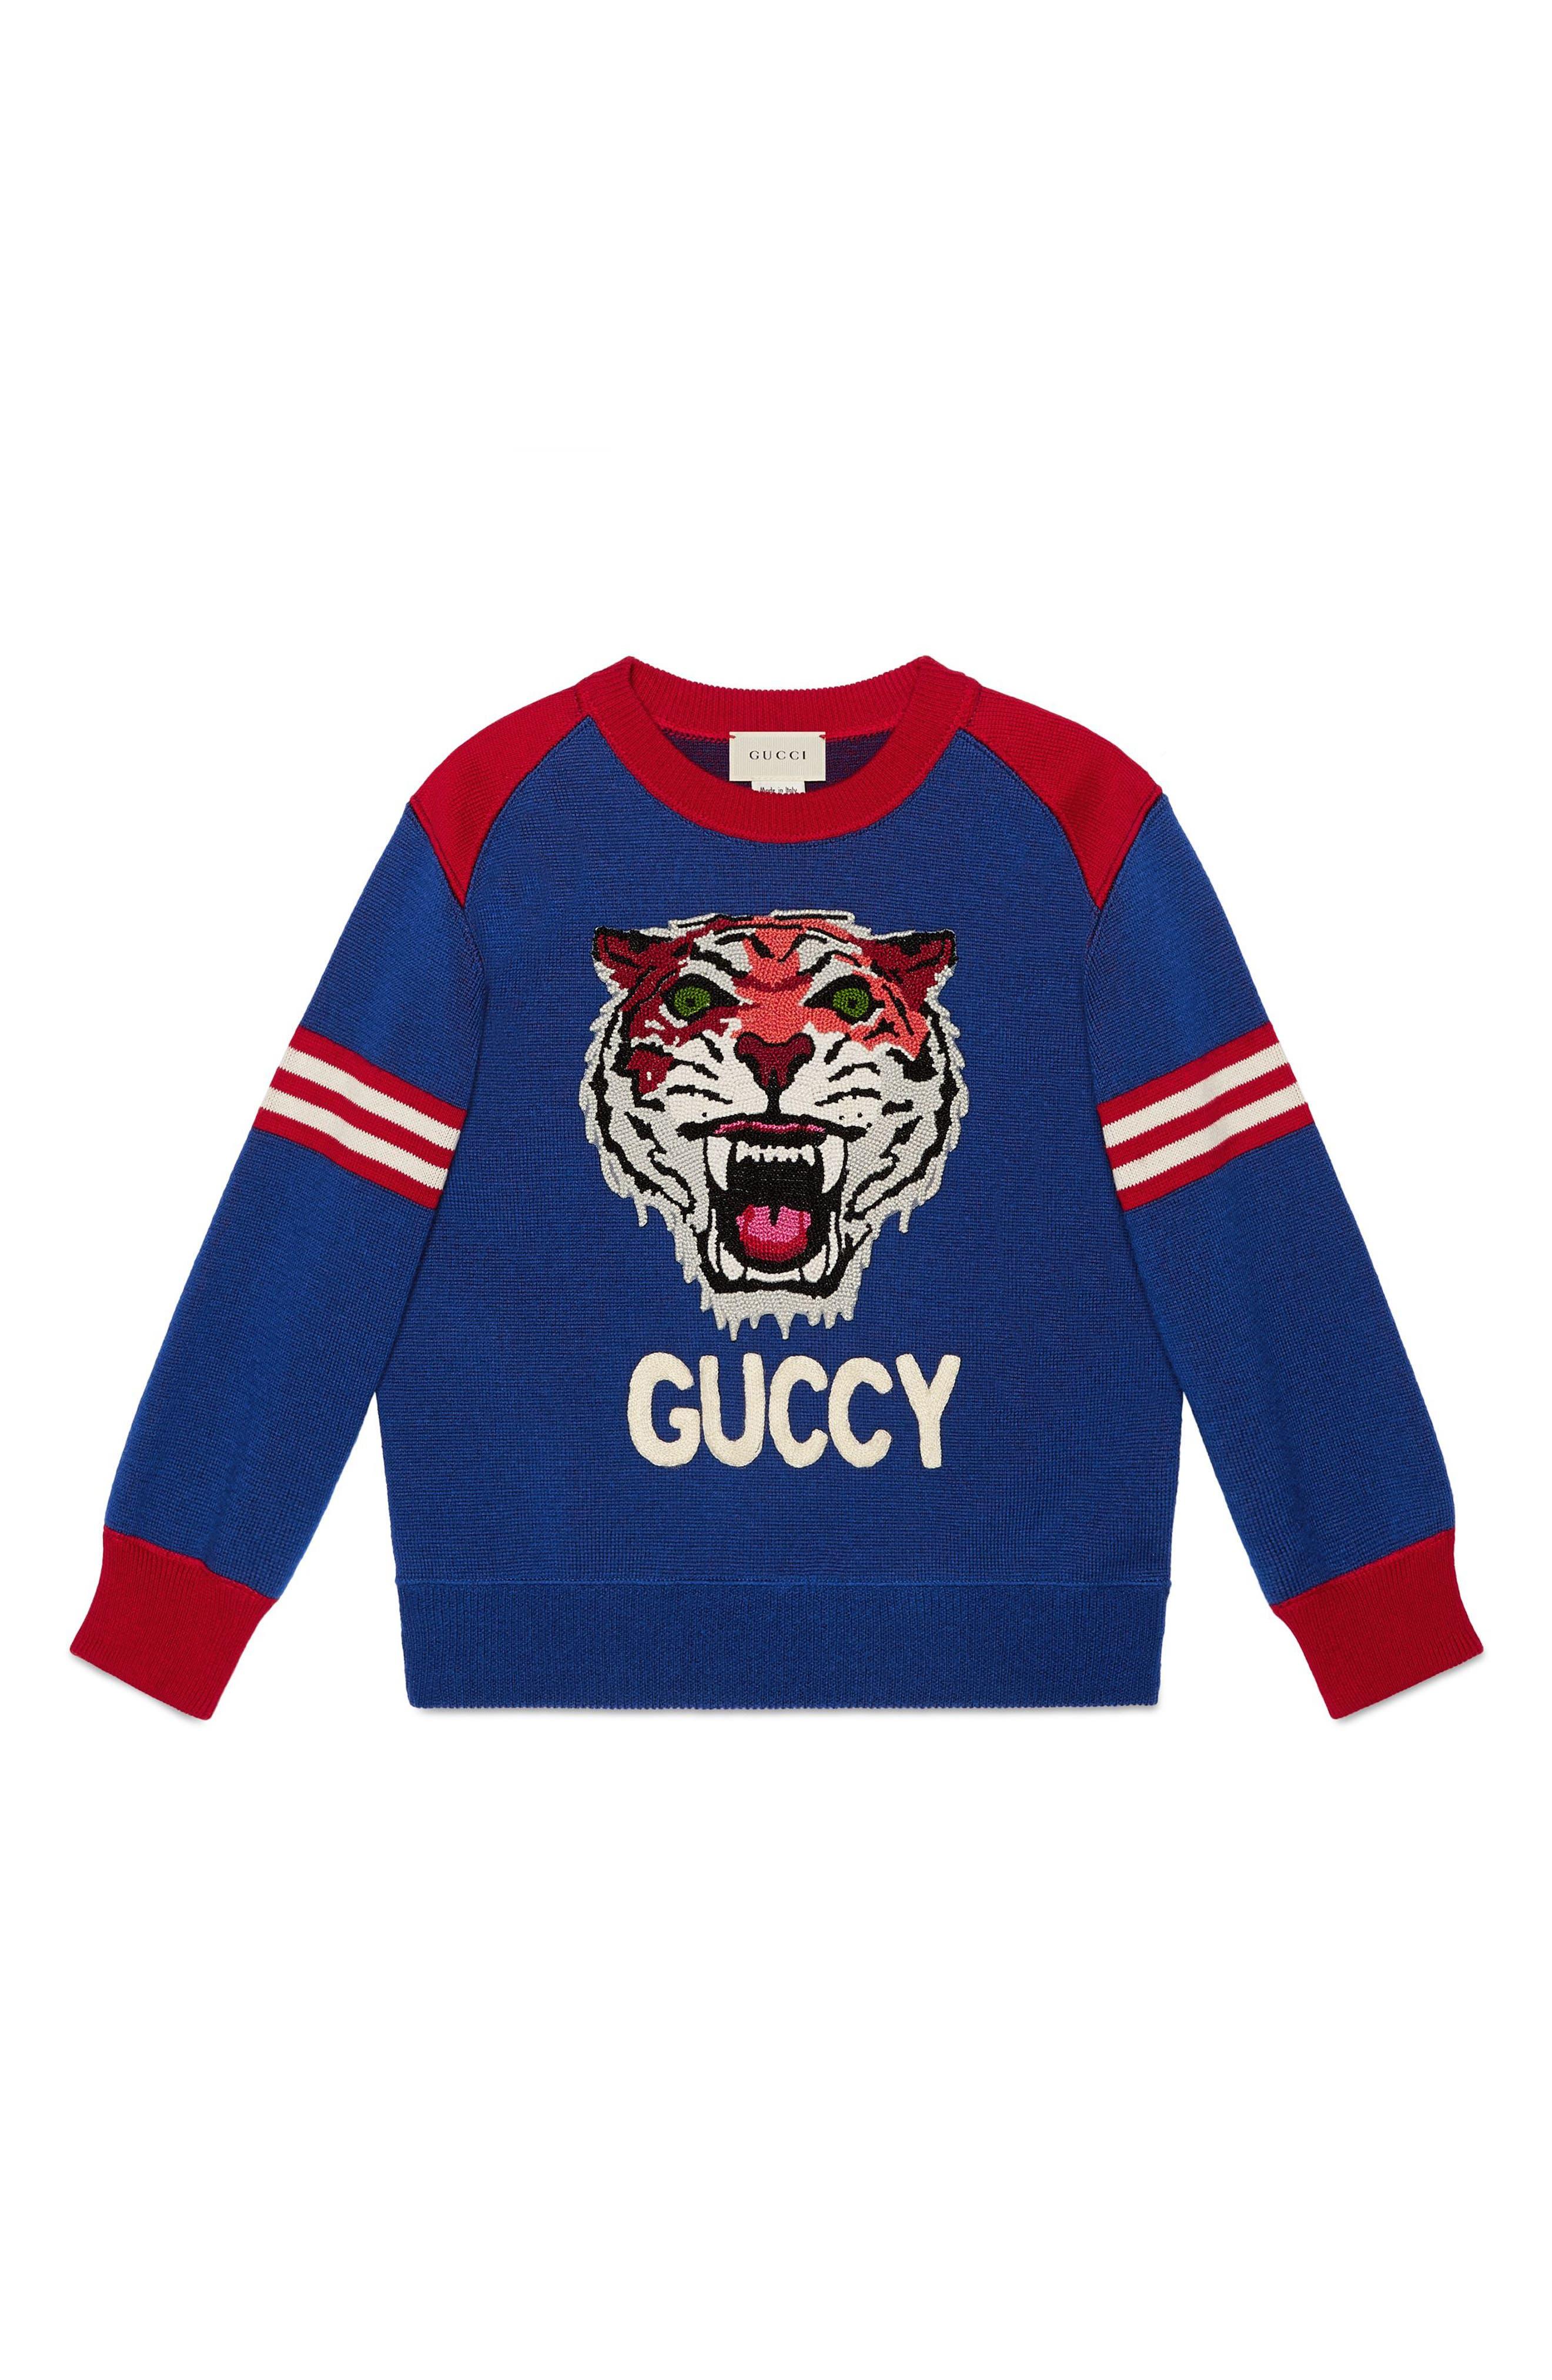 GUCCI Embroidered Sweater, Main, color, BLUE MULTI